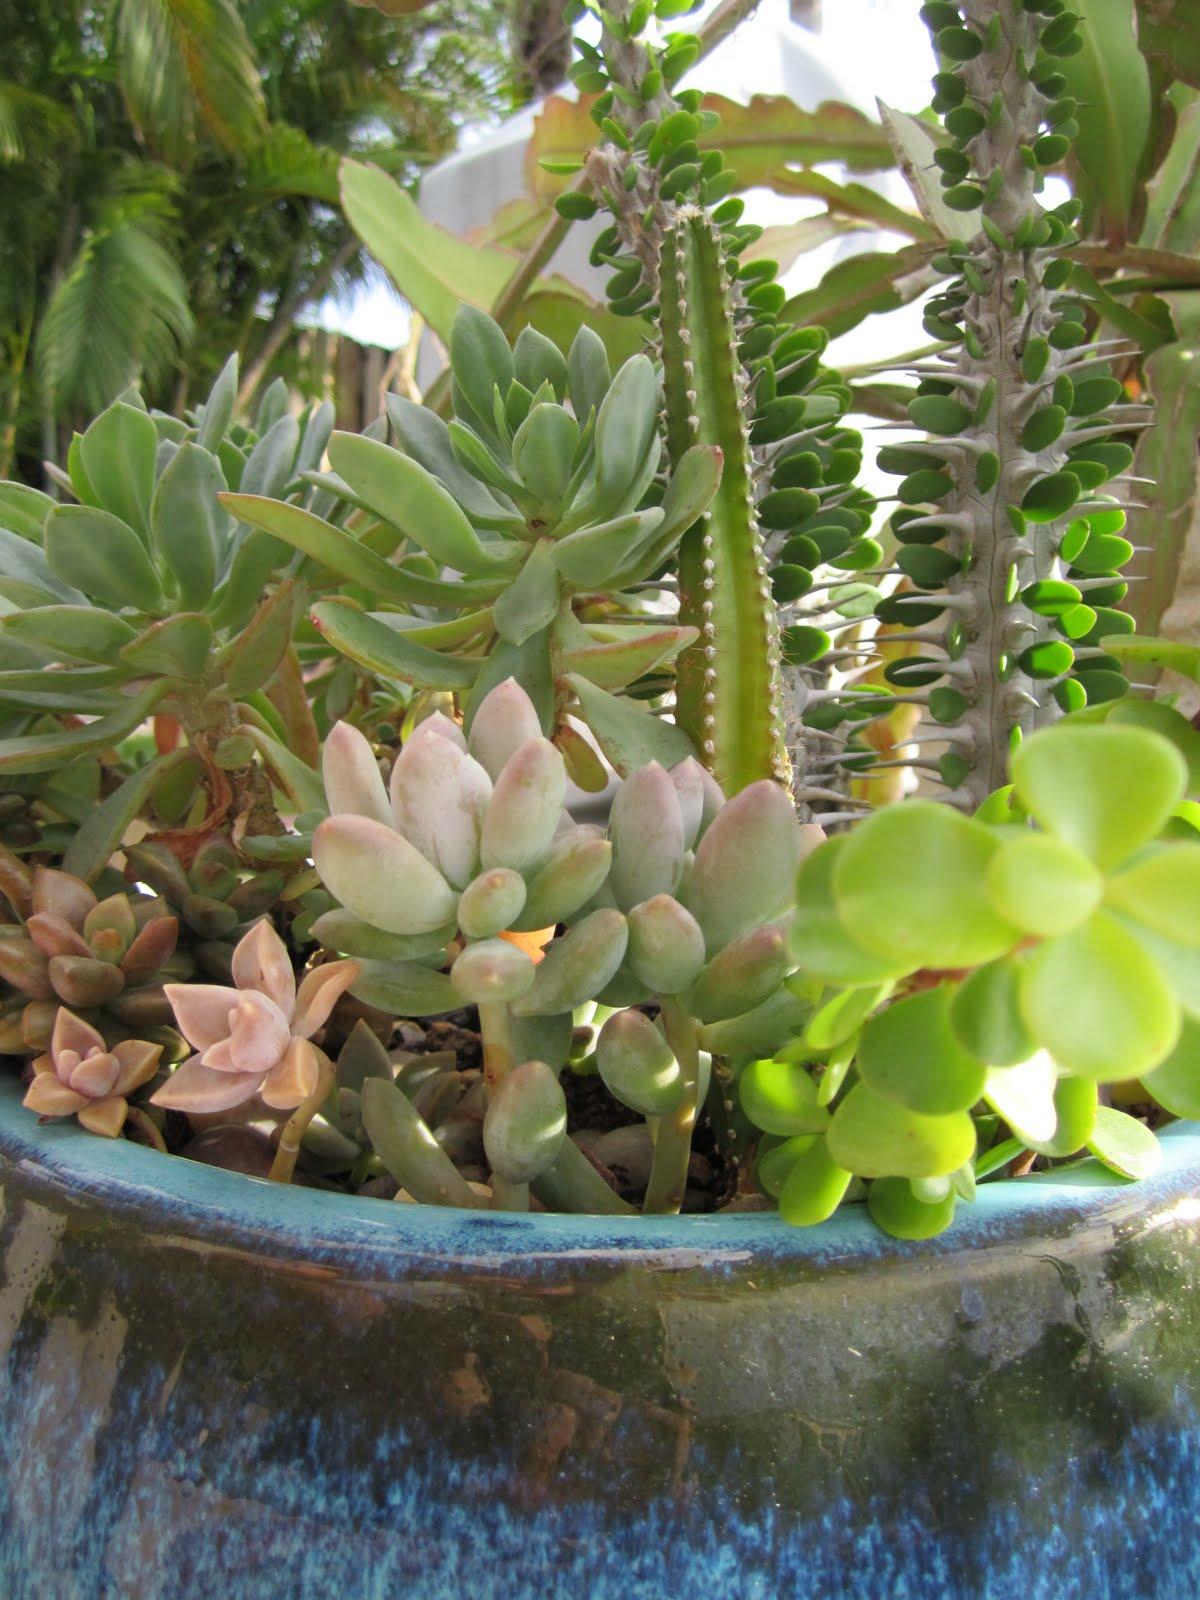 http://1.bp.blogspot.com/-urKLCILUSak/TeRNW4YoQ4I/AAAAAAAAJO4/HfAGSrN7mTo/s1600/Garden+Psuperography+by+Catherine+Michelena+of+Inspire+Bohemia+blog+-+IMG_1121.JPG